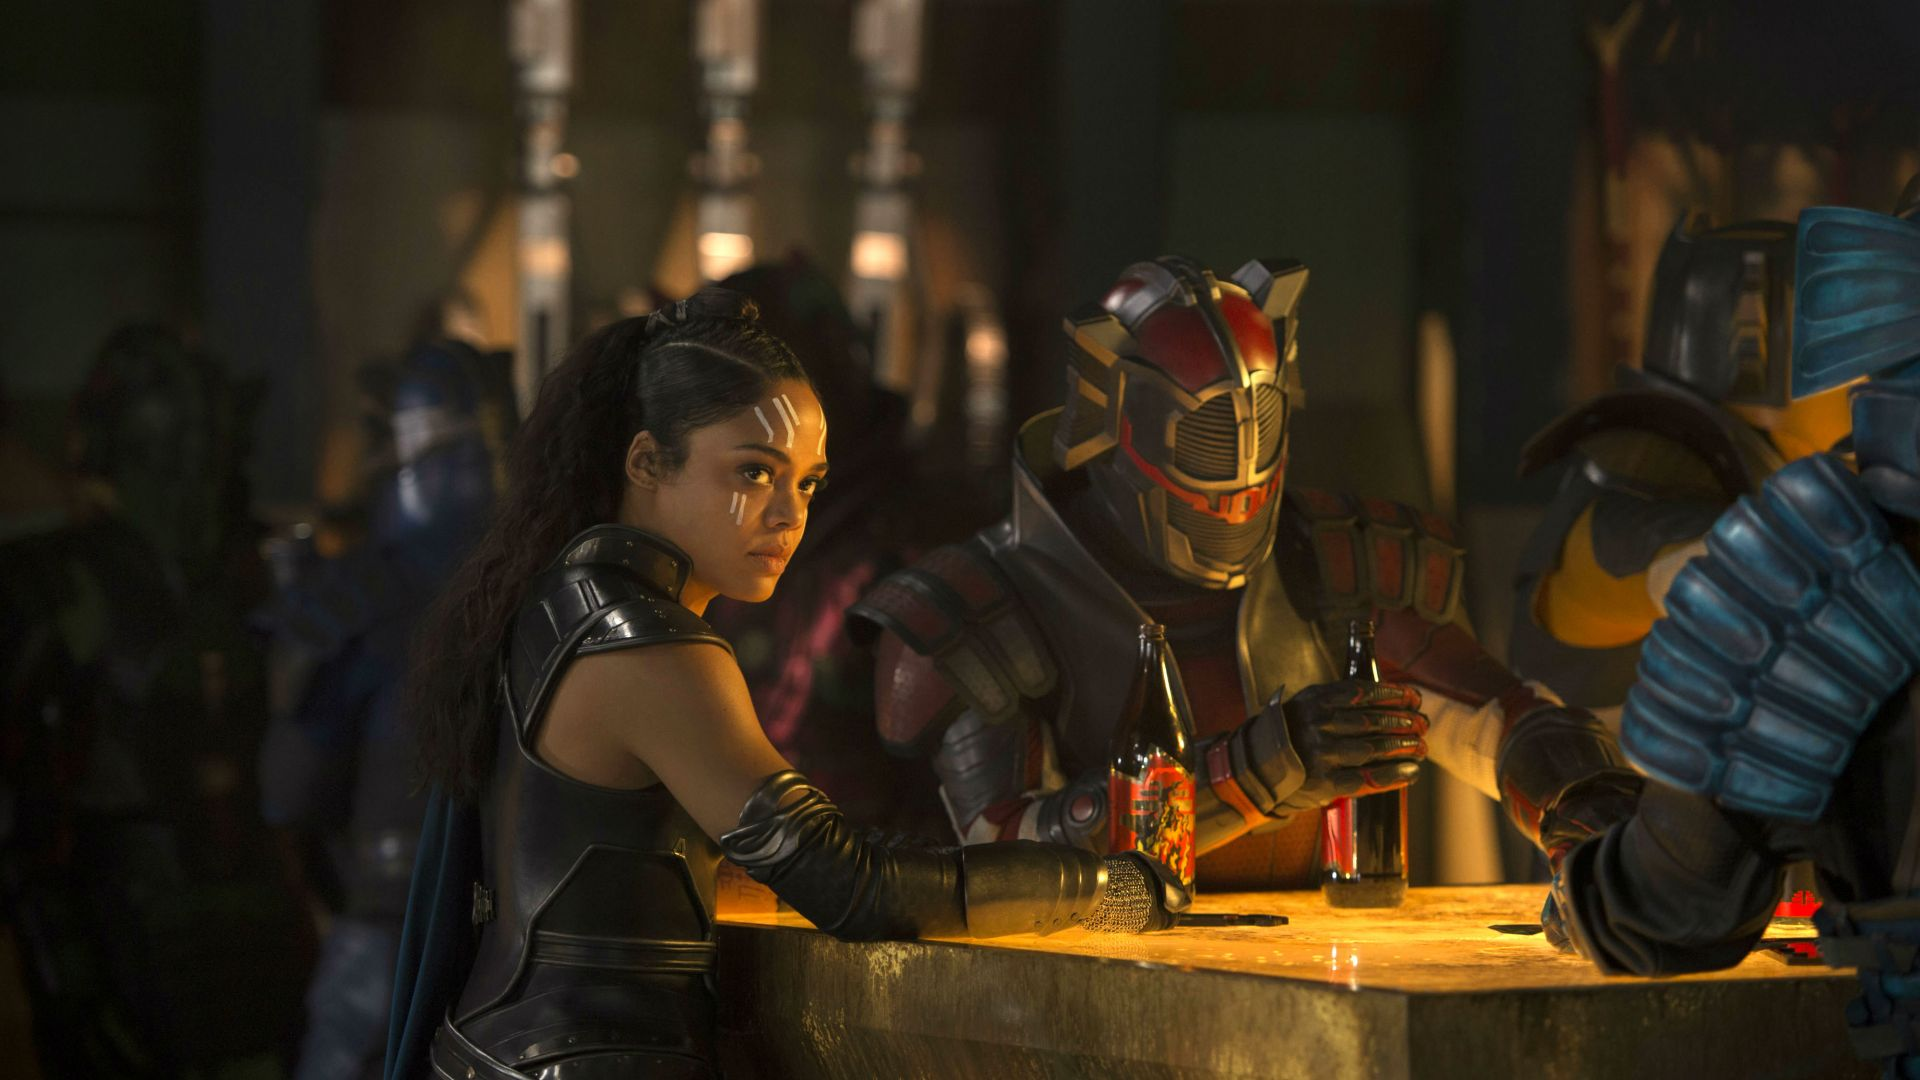 Wallpaper Thor: Ragnarok, Tessa Thompson, 4k, Movies #15397 - 웹